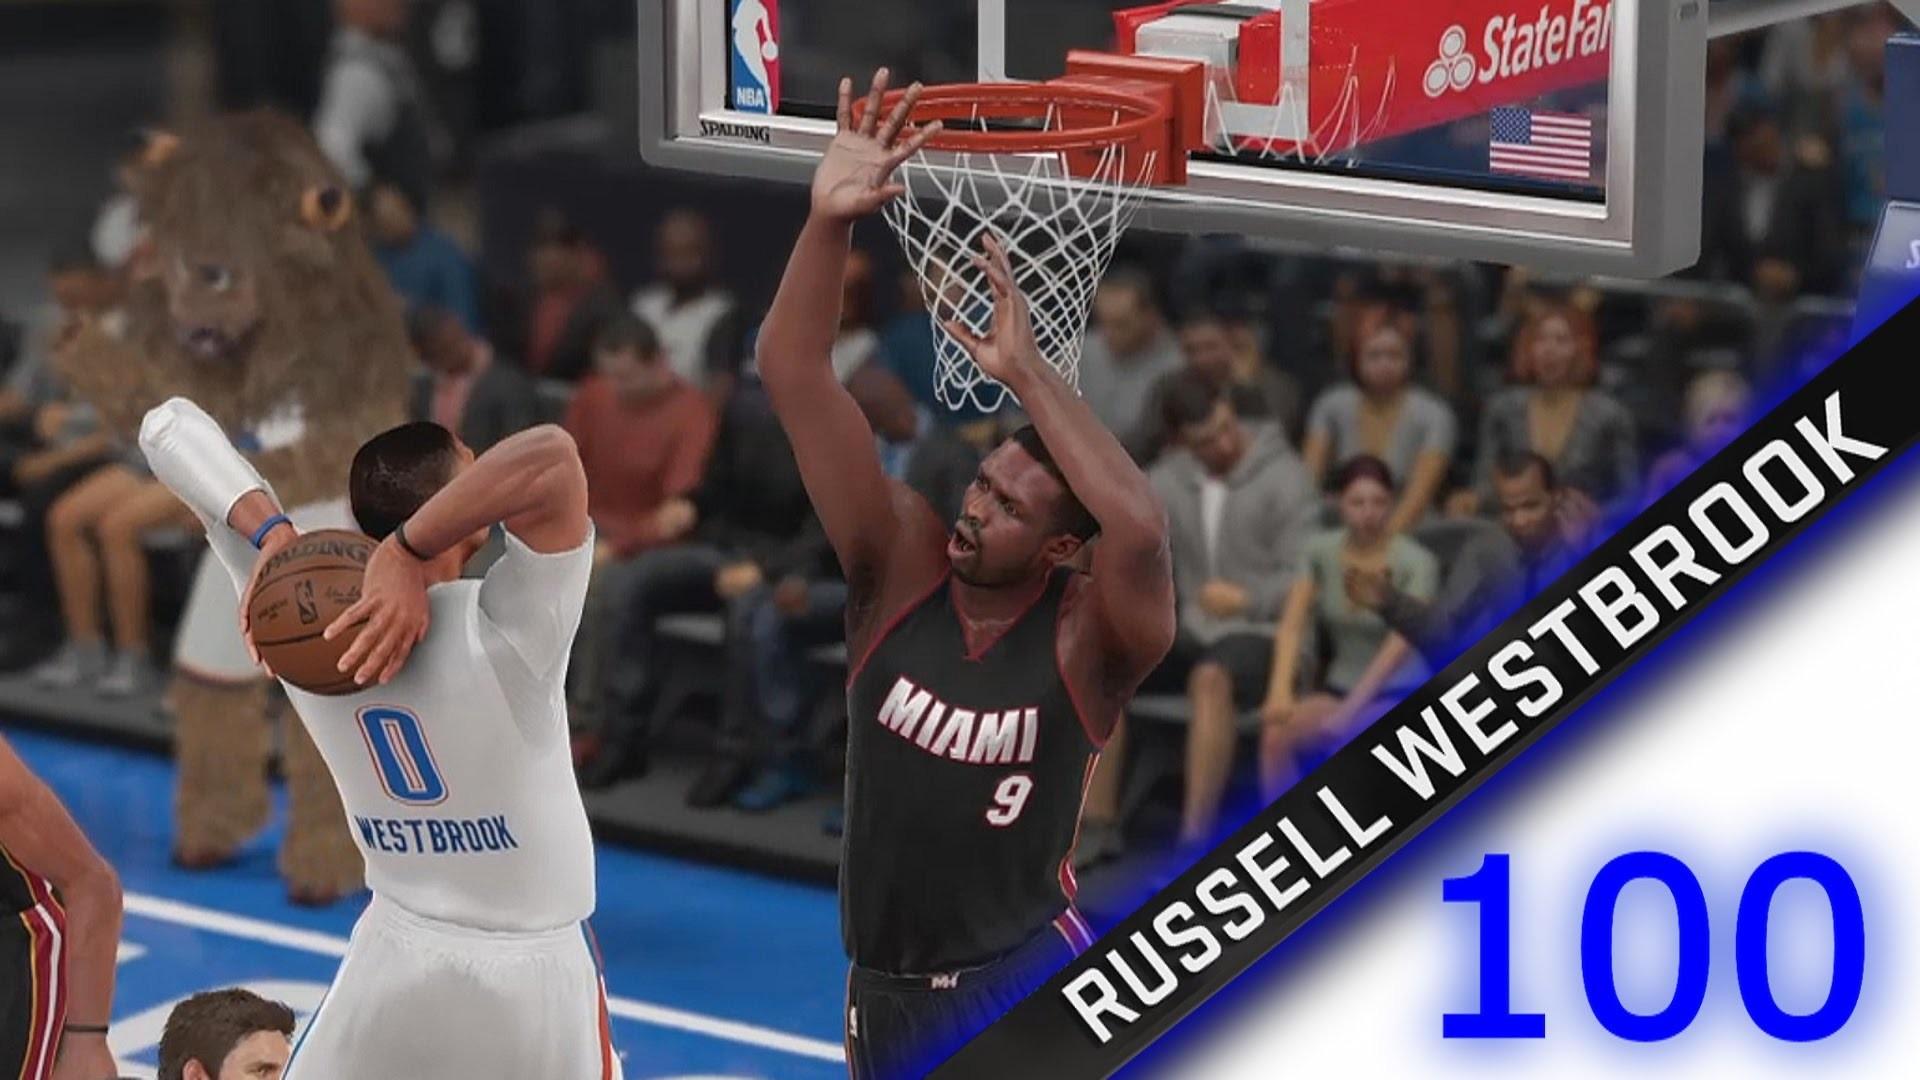 NBA 2K16 Diamond Russell Westbrook 100 Point Challenge | NBA 2K16 Russell  Westbrook Dunk Challenge – YouTube